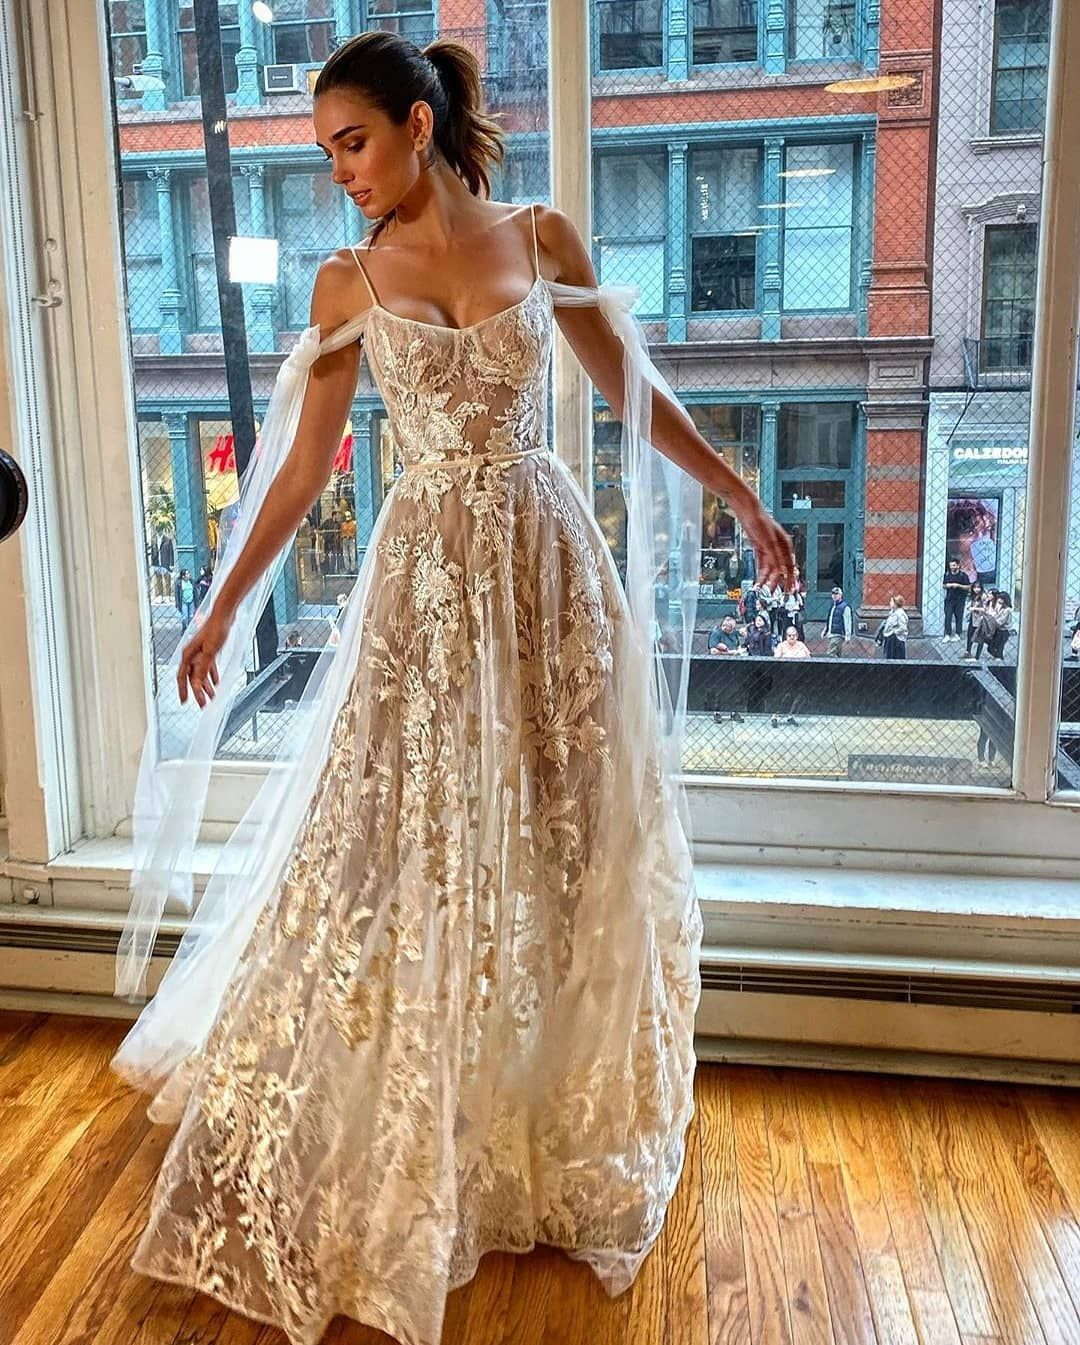 2 597 Likes 5 Comments Hera Dresses Heradresses On Instagram H E R A Dress By Berta Wedding Dresses Dresses Wedding Dresses Vintage Princess [ 1345 x 1080 Pixel ]